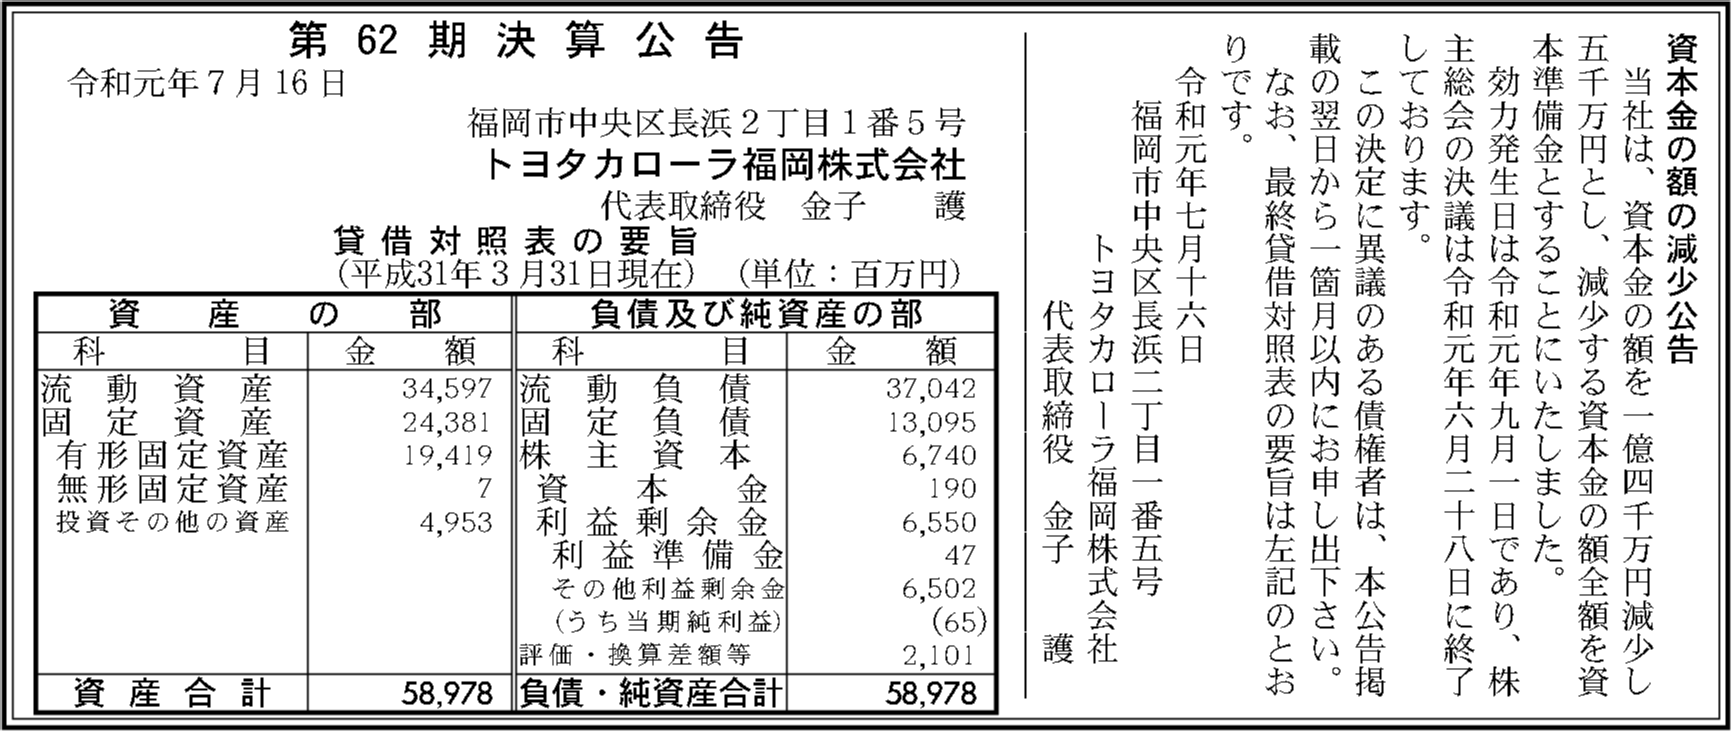 0124 a9da60983c568a890761e6f5f9e42dec9aa7d6dd3abab18a3e89c36575db4680d7ac062cfc1e75ece17b07b75894dda691e8f9d1d9941c824a30628bb8475c04 02